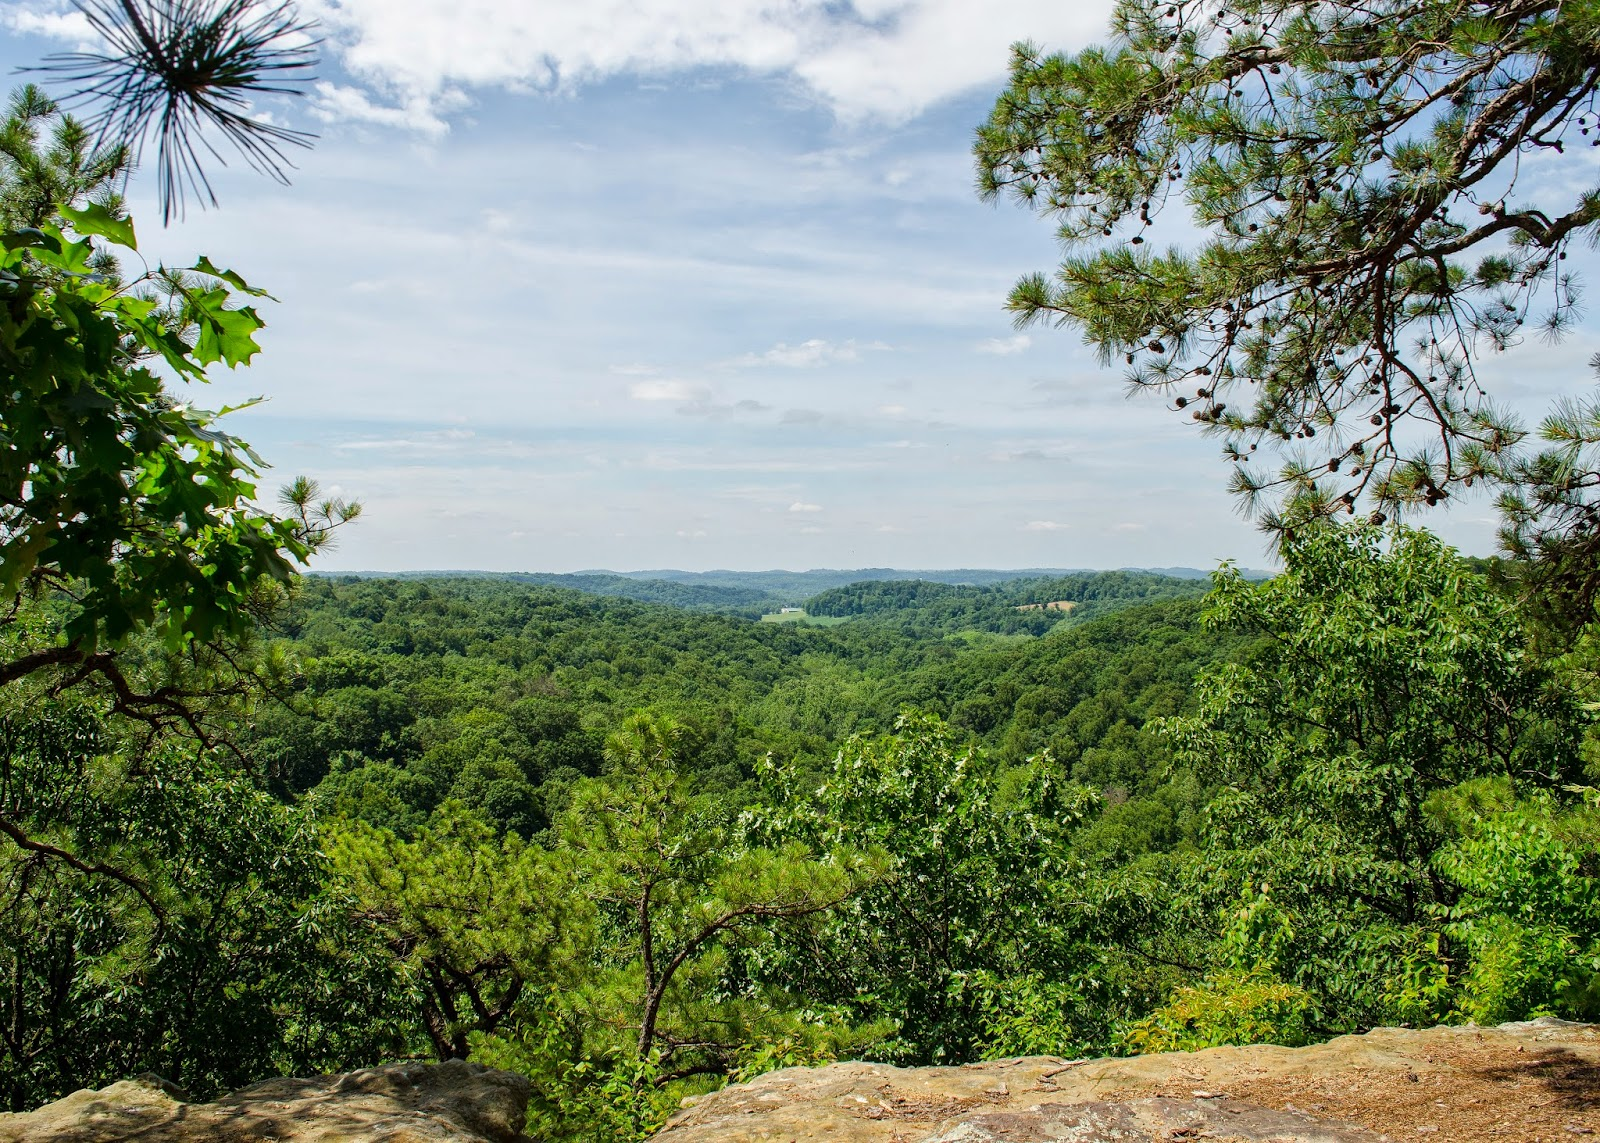 Christmas Rocks State Nature Preserve